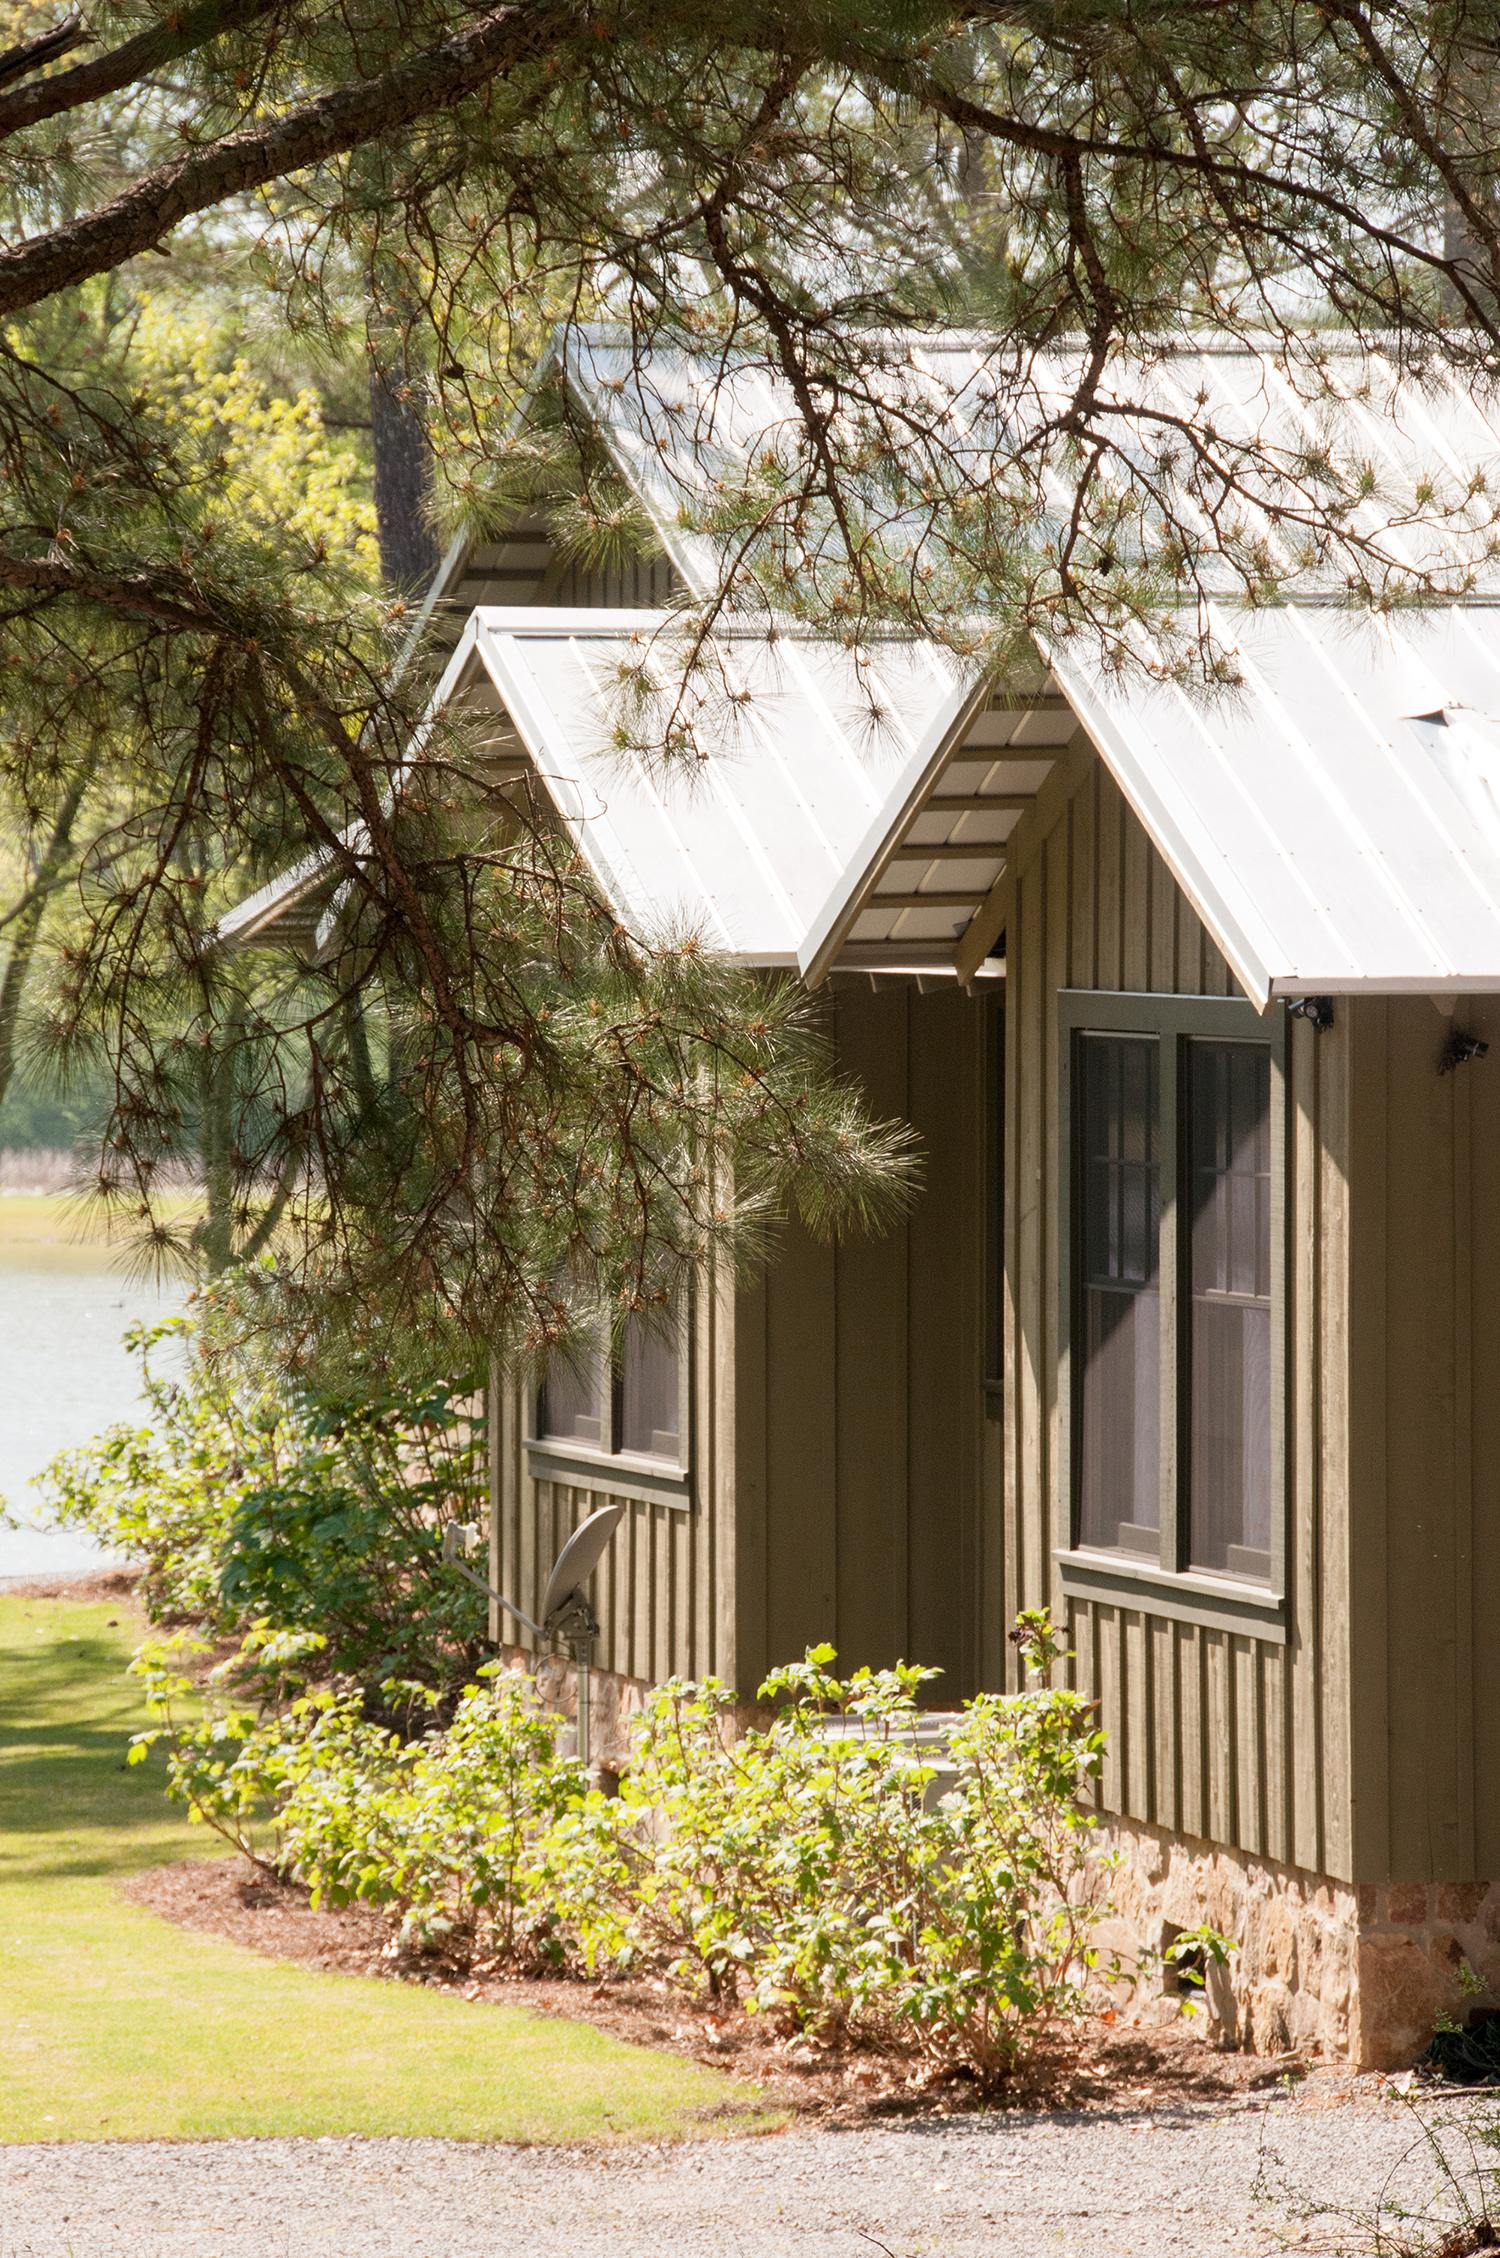 sugar_creek_farm_51_lakehouse_lake_house_guest_bedroom_farmhouse_view_tin_roof_1500.jpg